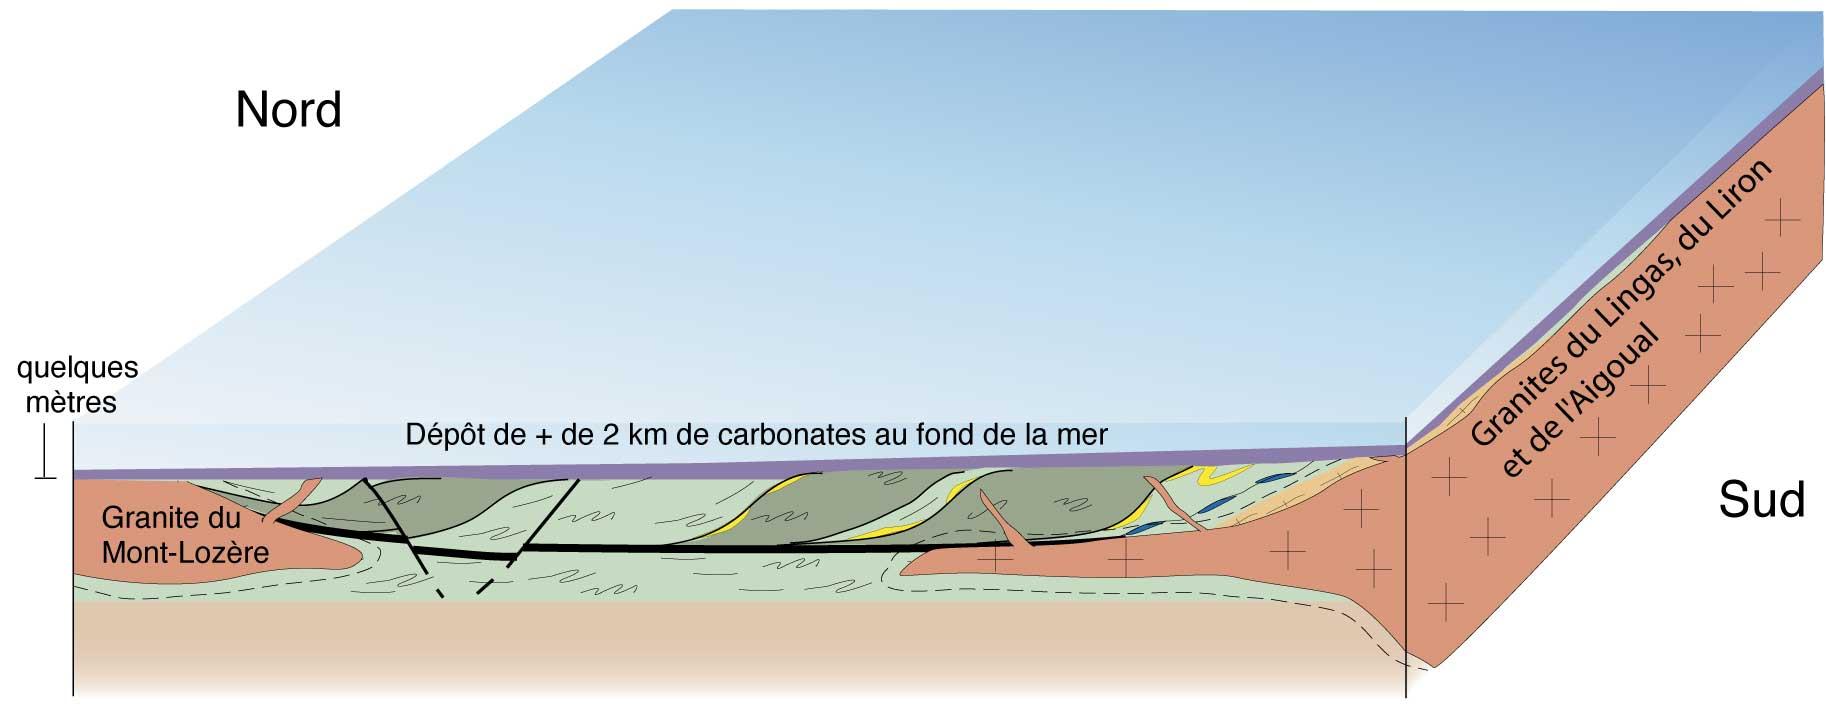 Il y a 250 Ma, la mer envahit progressivement la région.